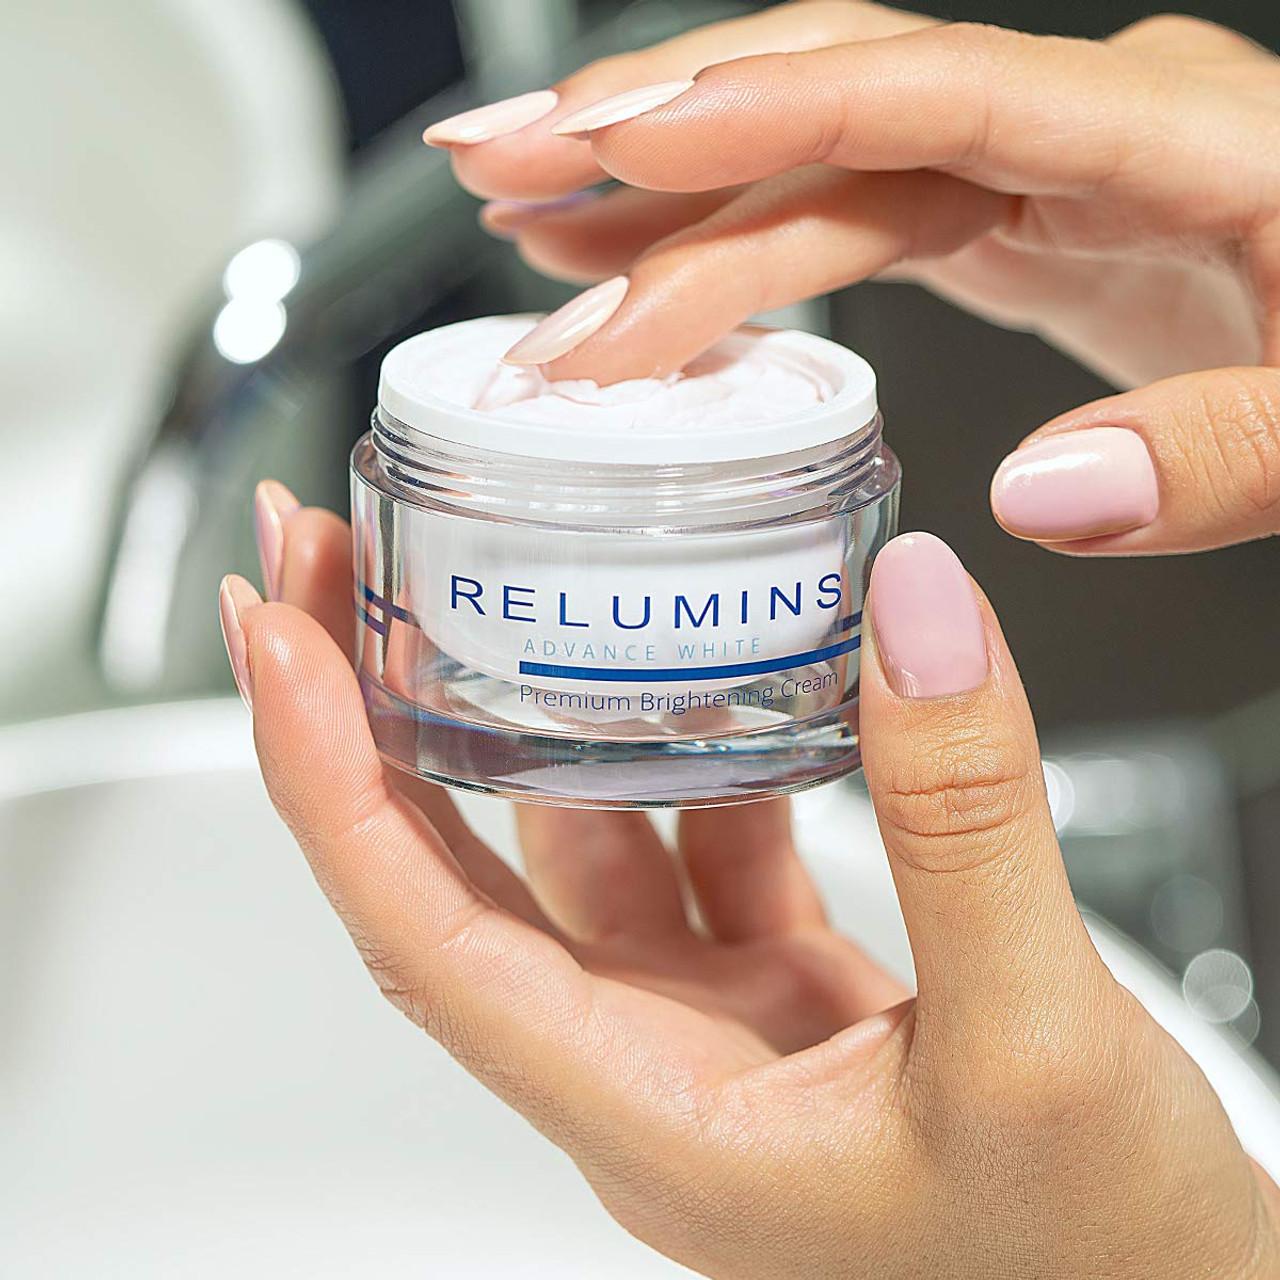 Relumins Advance White TA Stem Cell Premium Brightening Day Cream